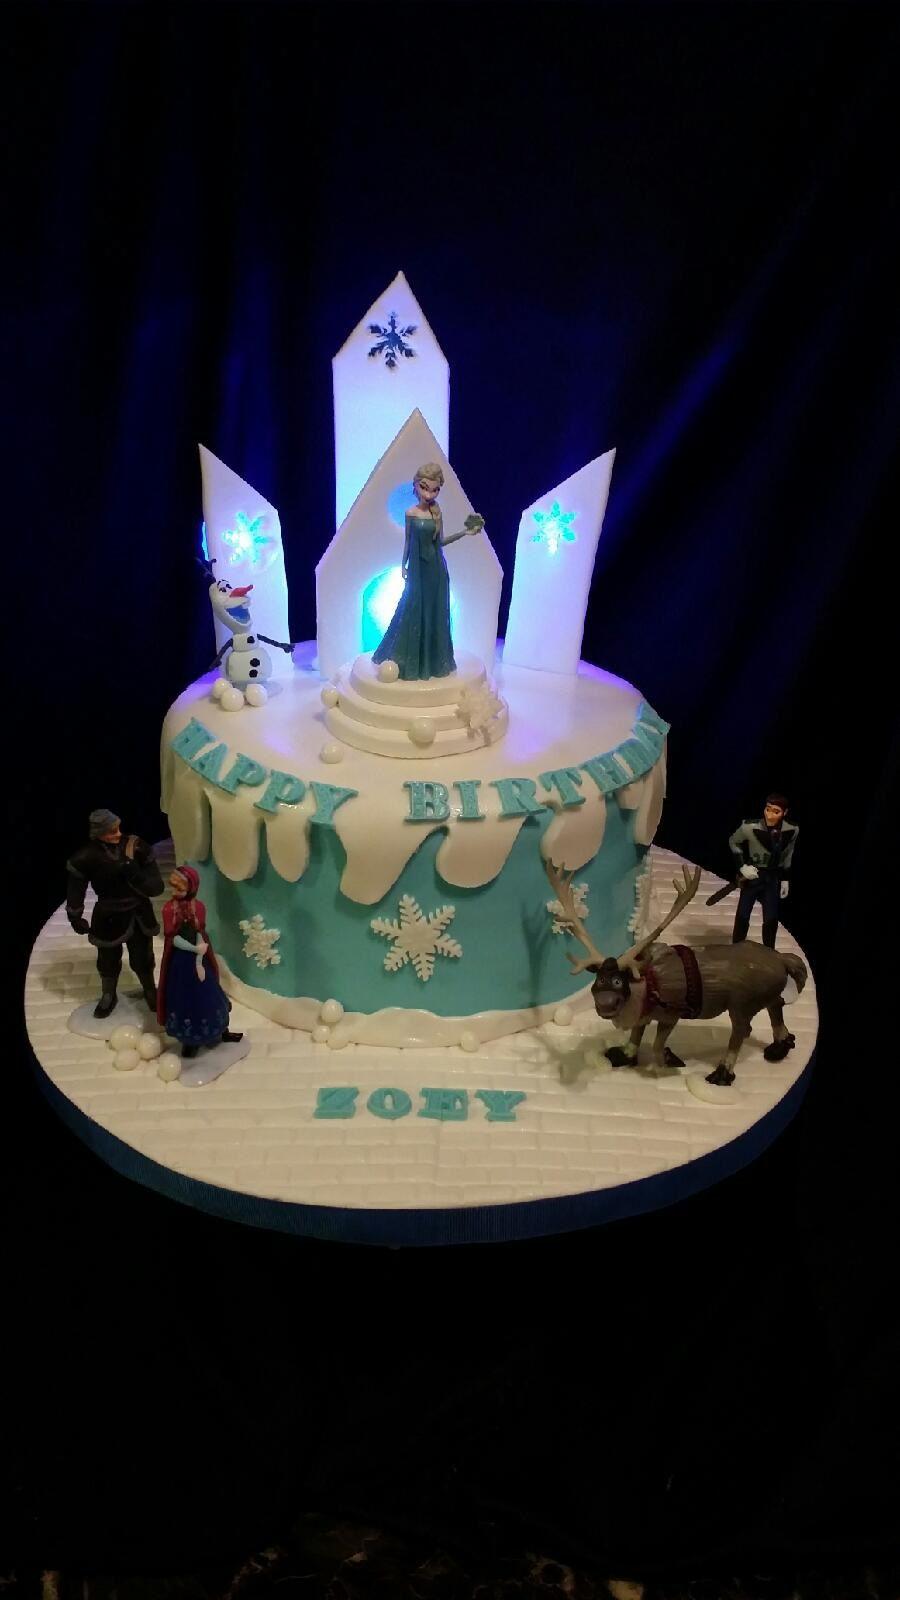 Crossfit Baby Shower Cake